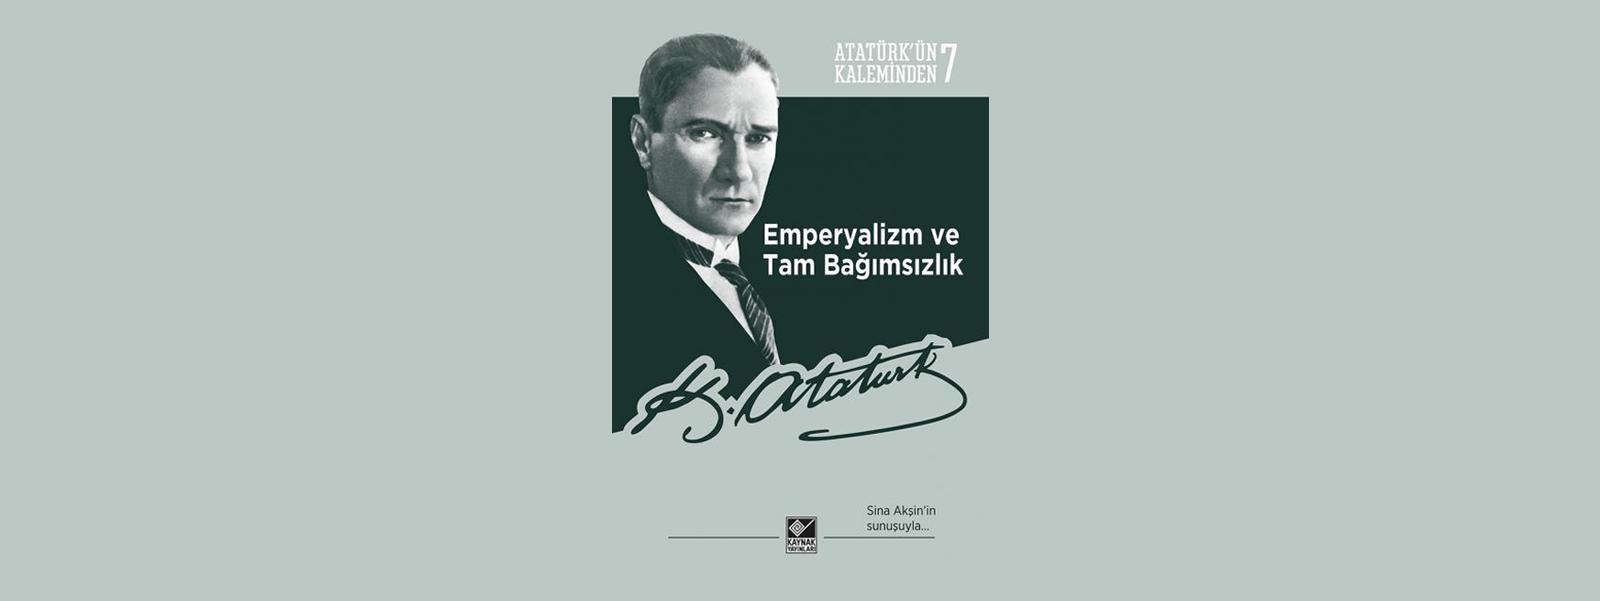 Atatürk ve Emperyalizm